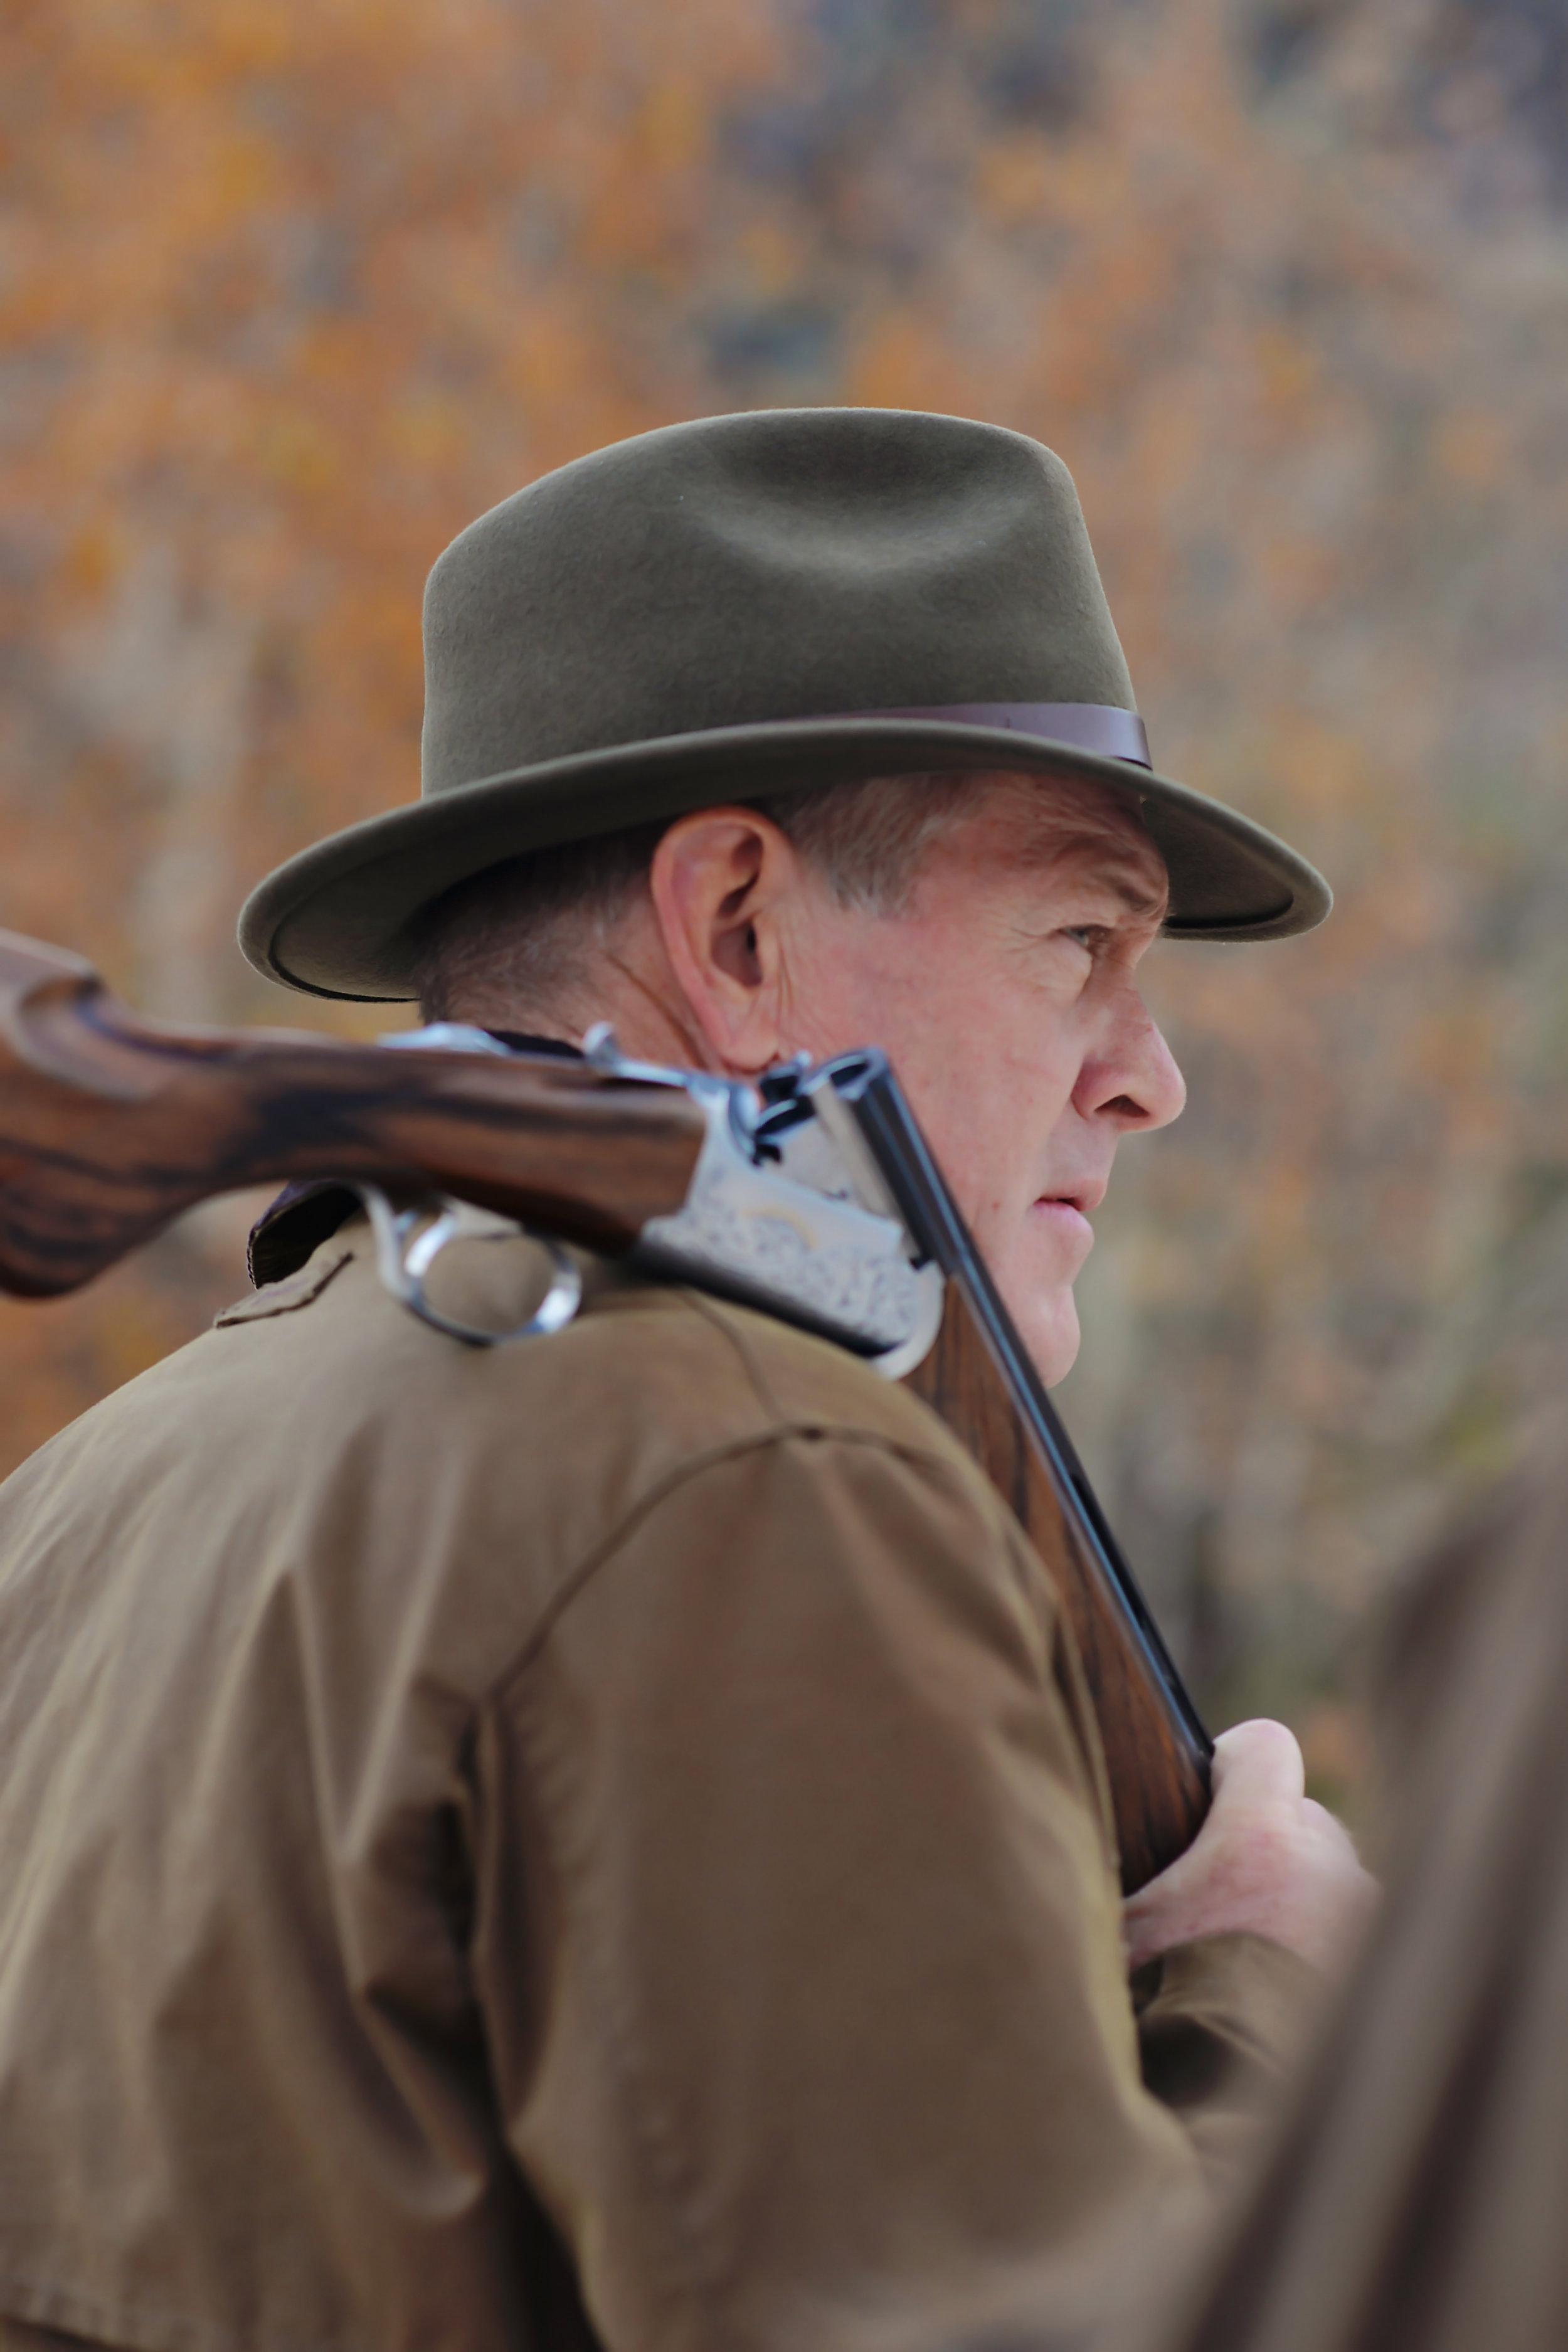 - Steve Johnston - gunsmith, NSCA Level I instructor, avid outdoorsman and sporting enthusiast